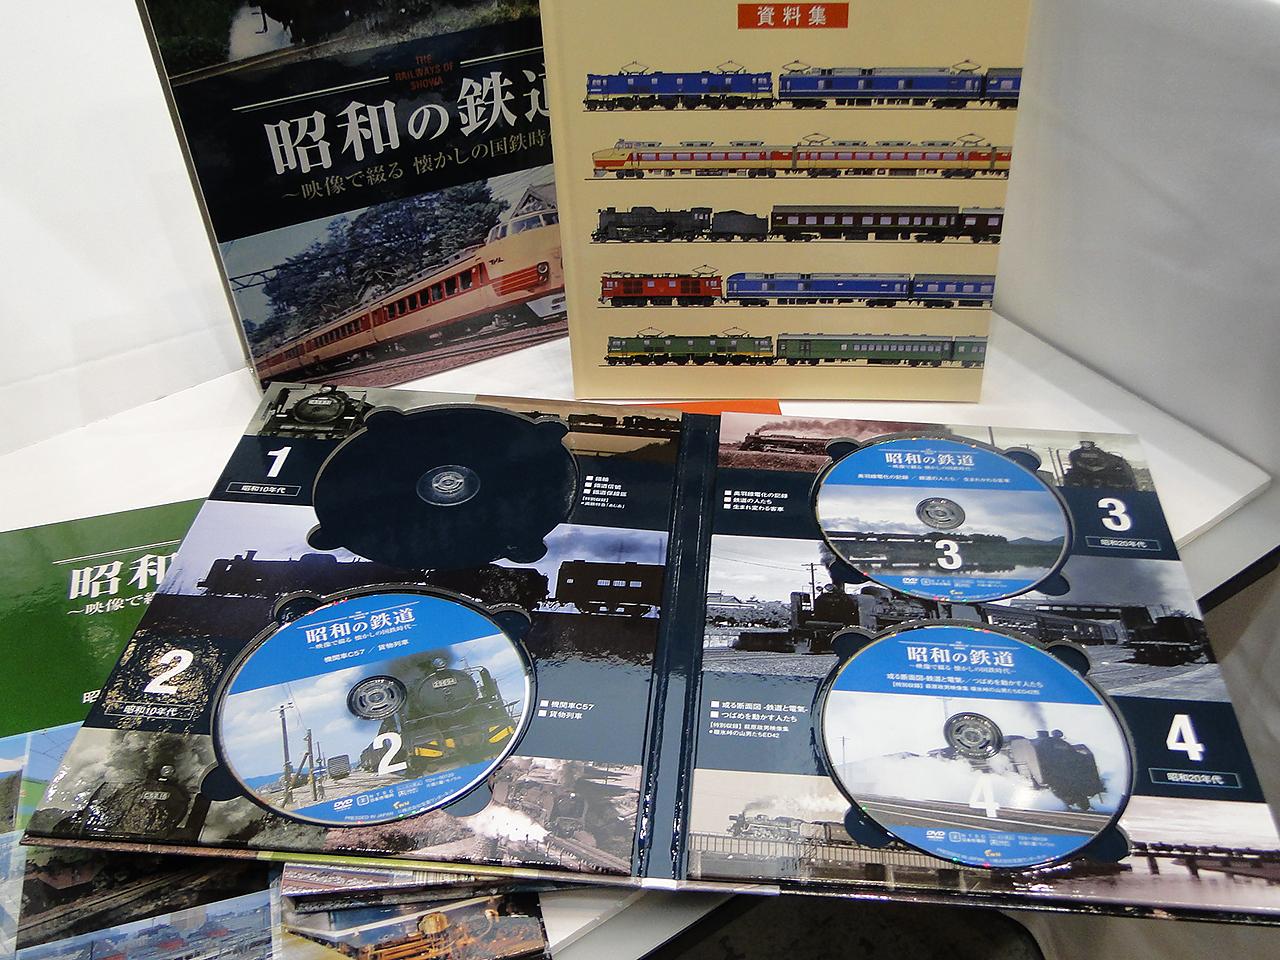 http://moritetsu.info/train/img/DSC09543ss.jpg